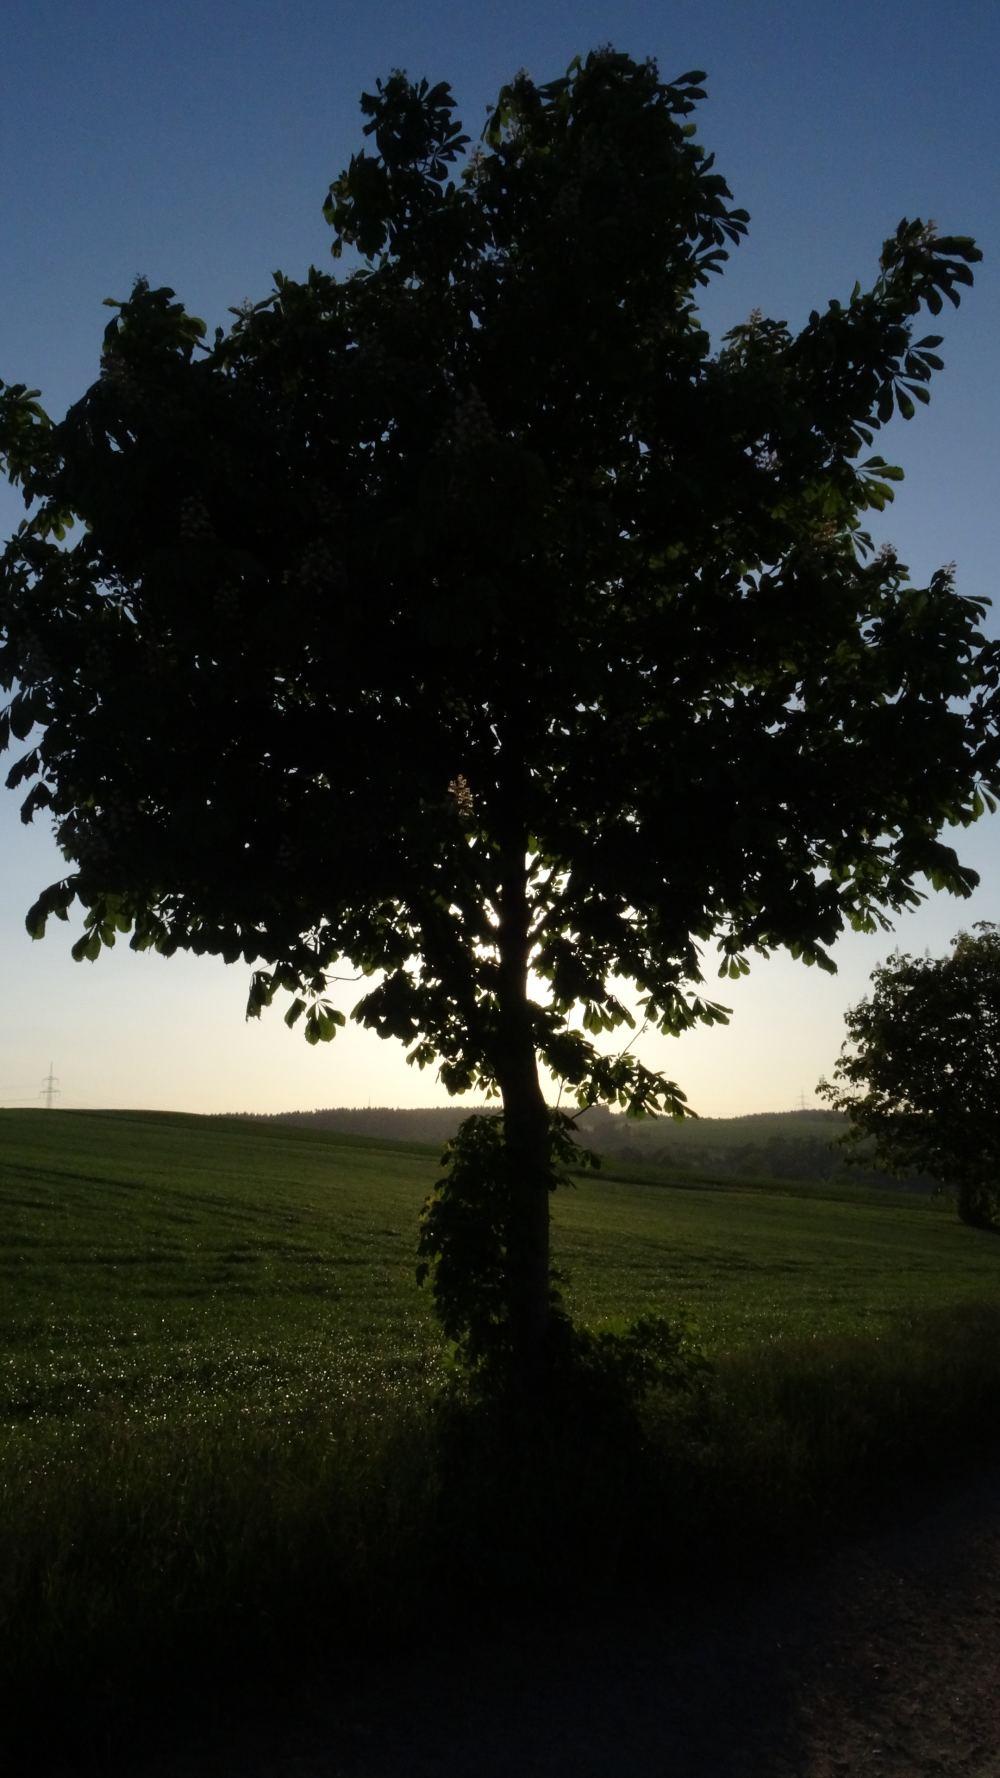 Baum verdeckt Sonnenuntergang (4K, 2160p, 16:9, Hochformat, 05.06.2015, Erzgebirge)